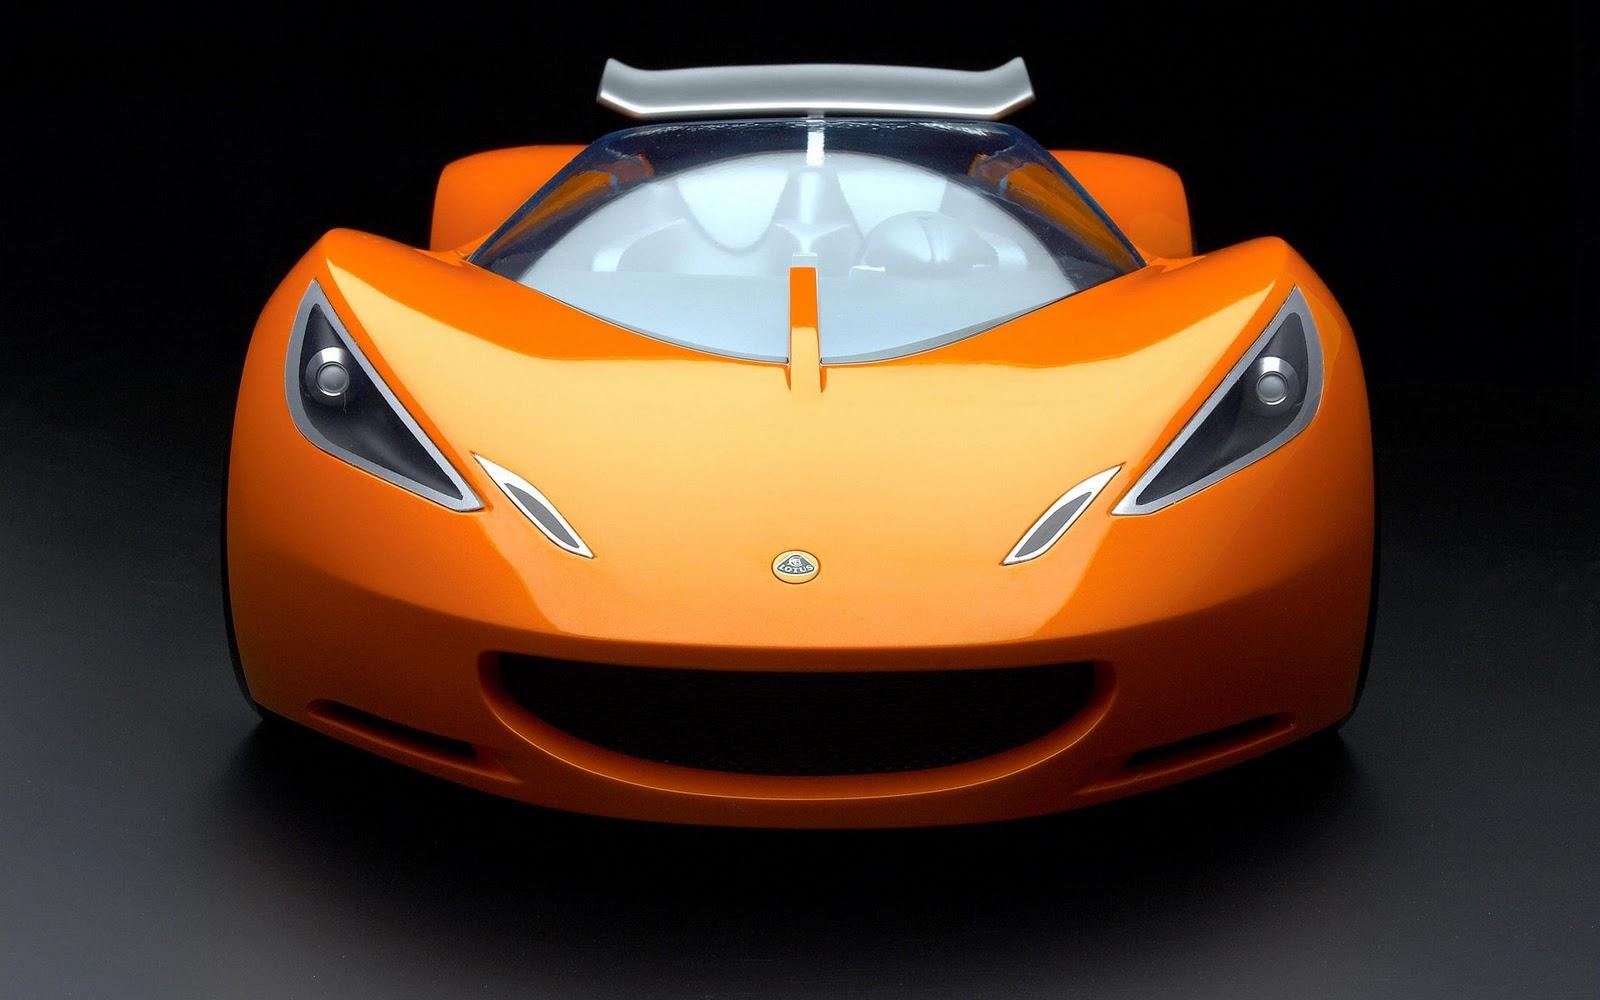 http://4.bp.blogspot.com/_F9TnFIwpoK0/TMMviYGbeWI/AAAAAAAAAF4/DsbkB5qaTqU/s1600/cars-hd-wallpapers-5%5B1%5D.jpg